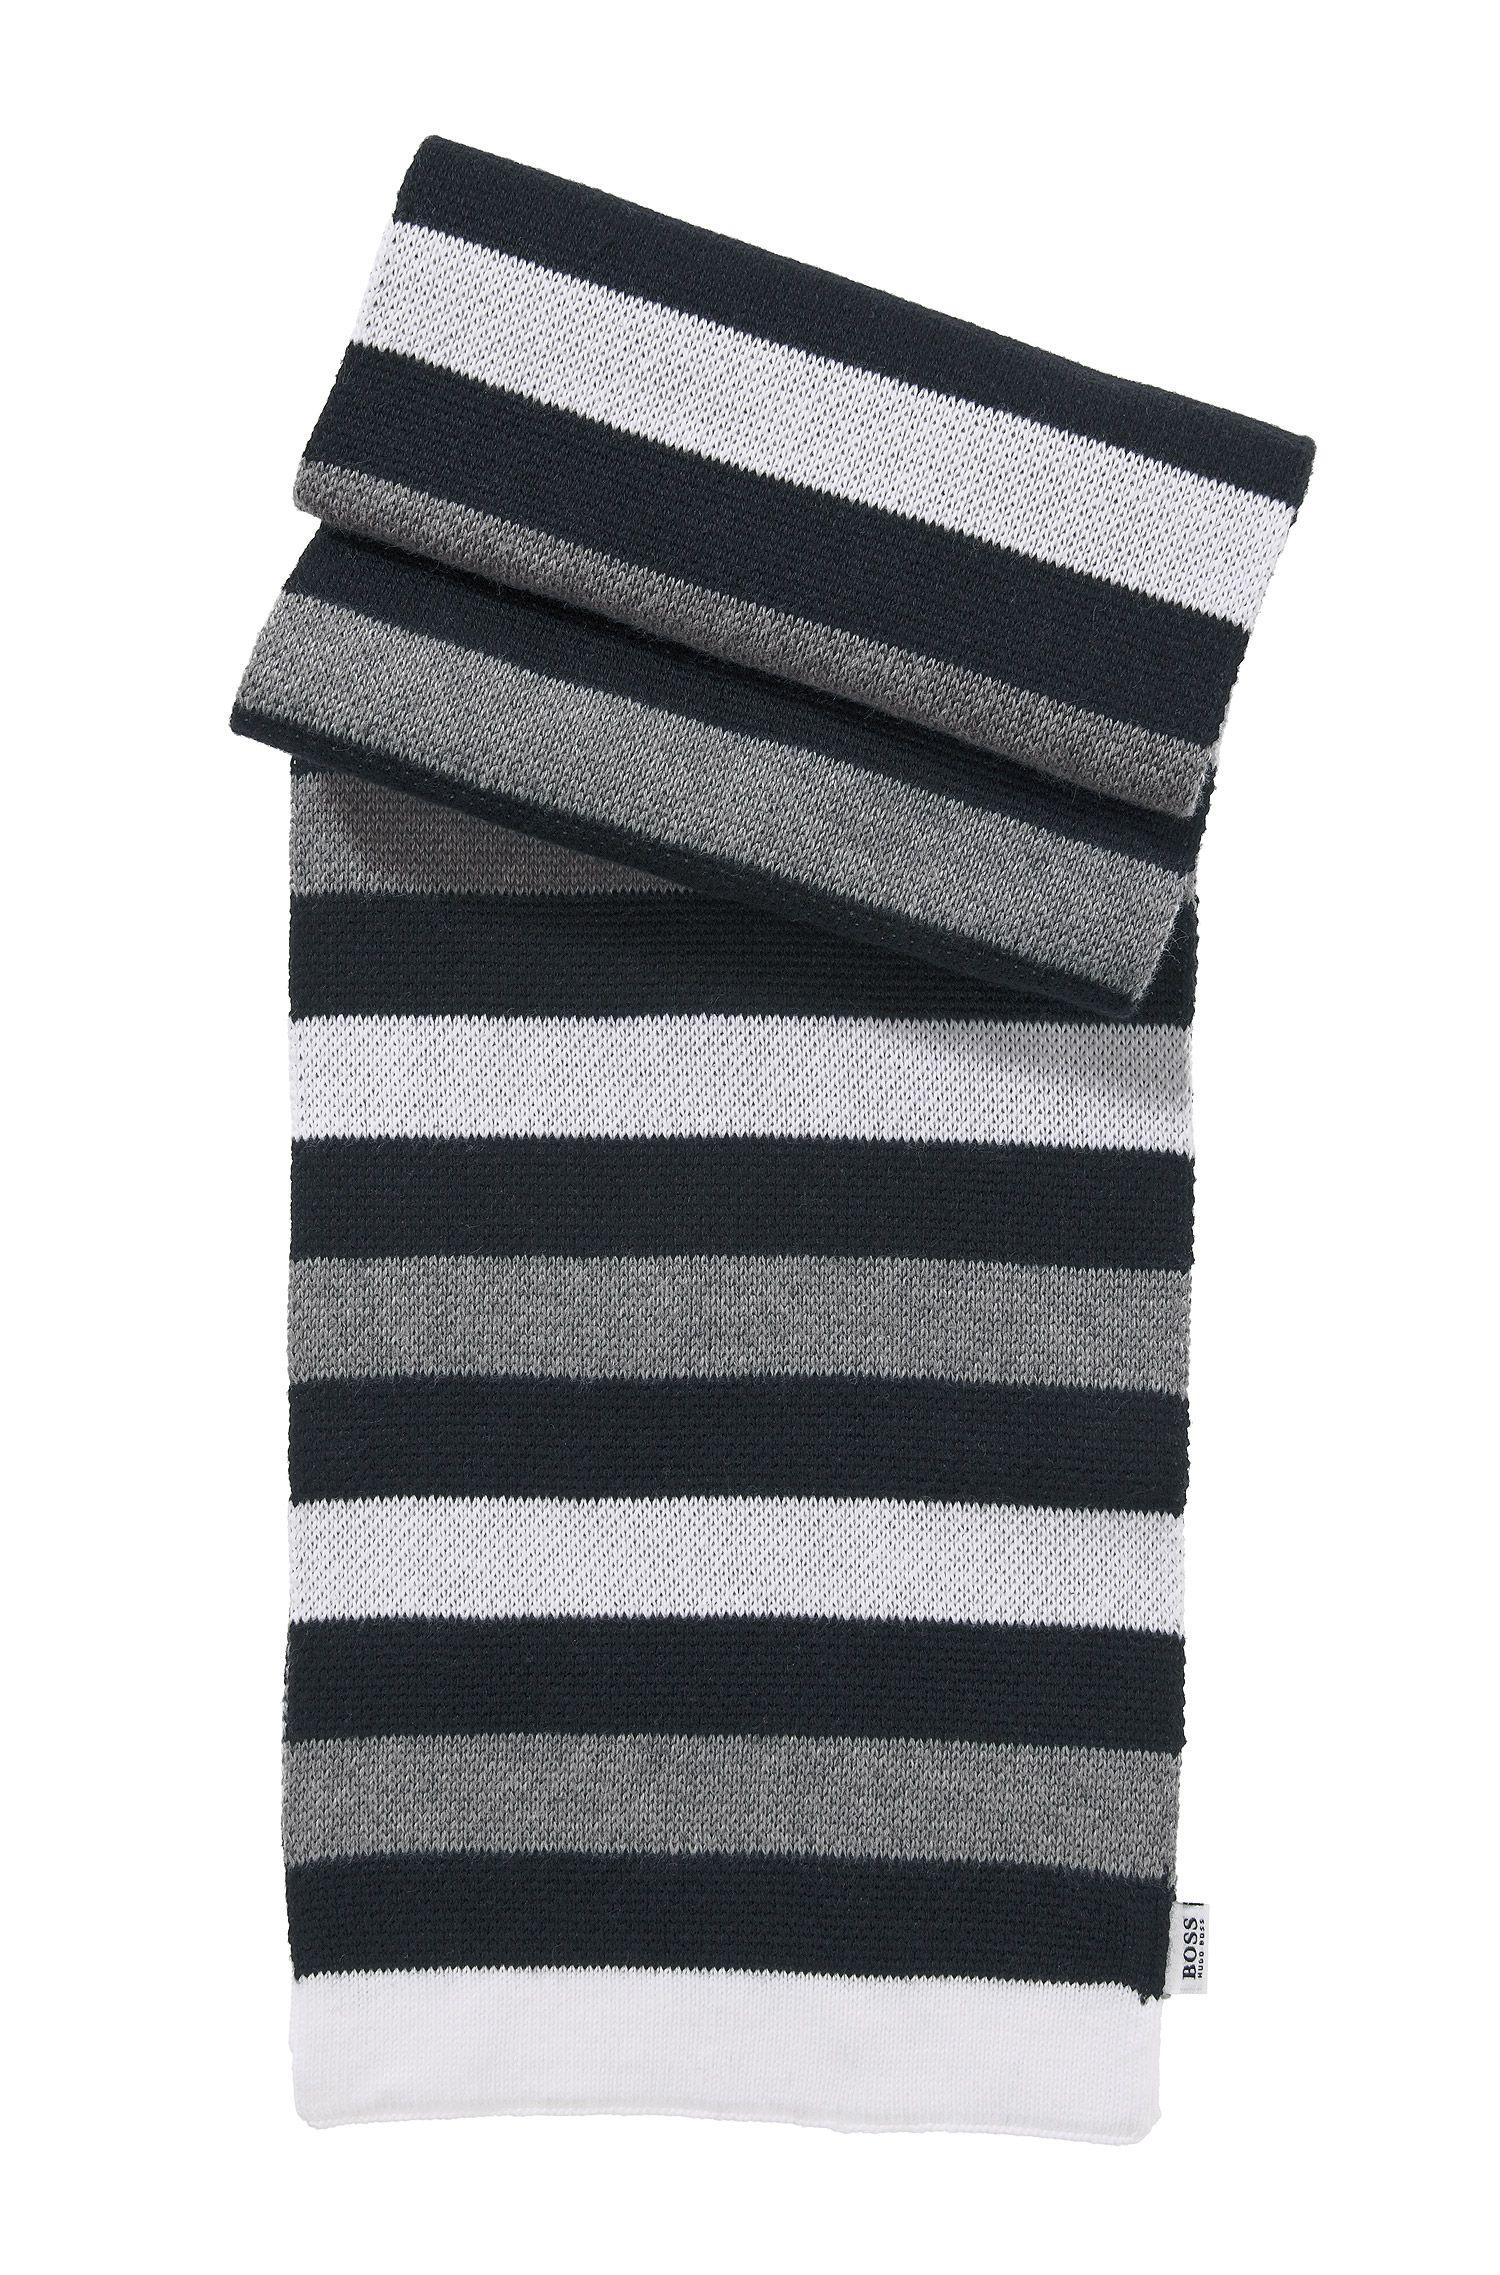 'J01041'   Knit Cotton Scarf